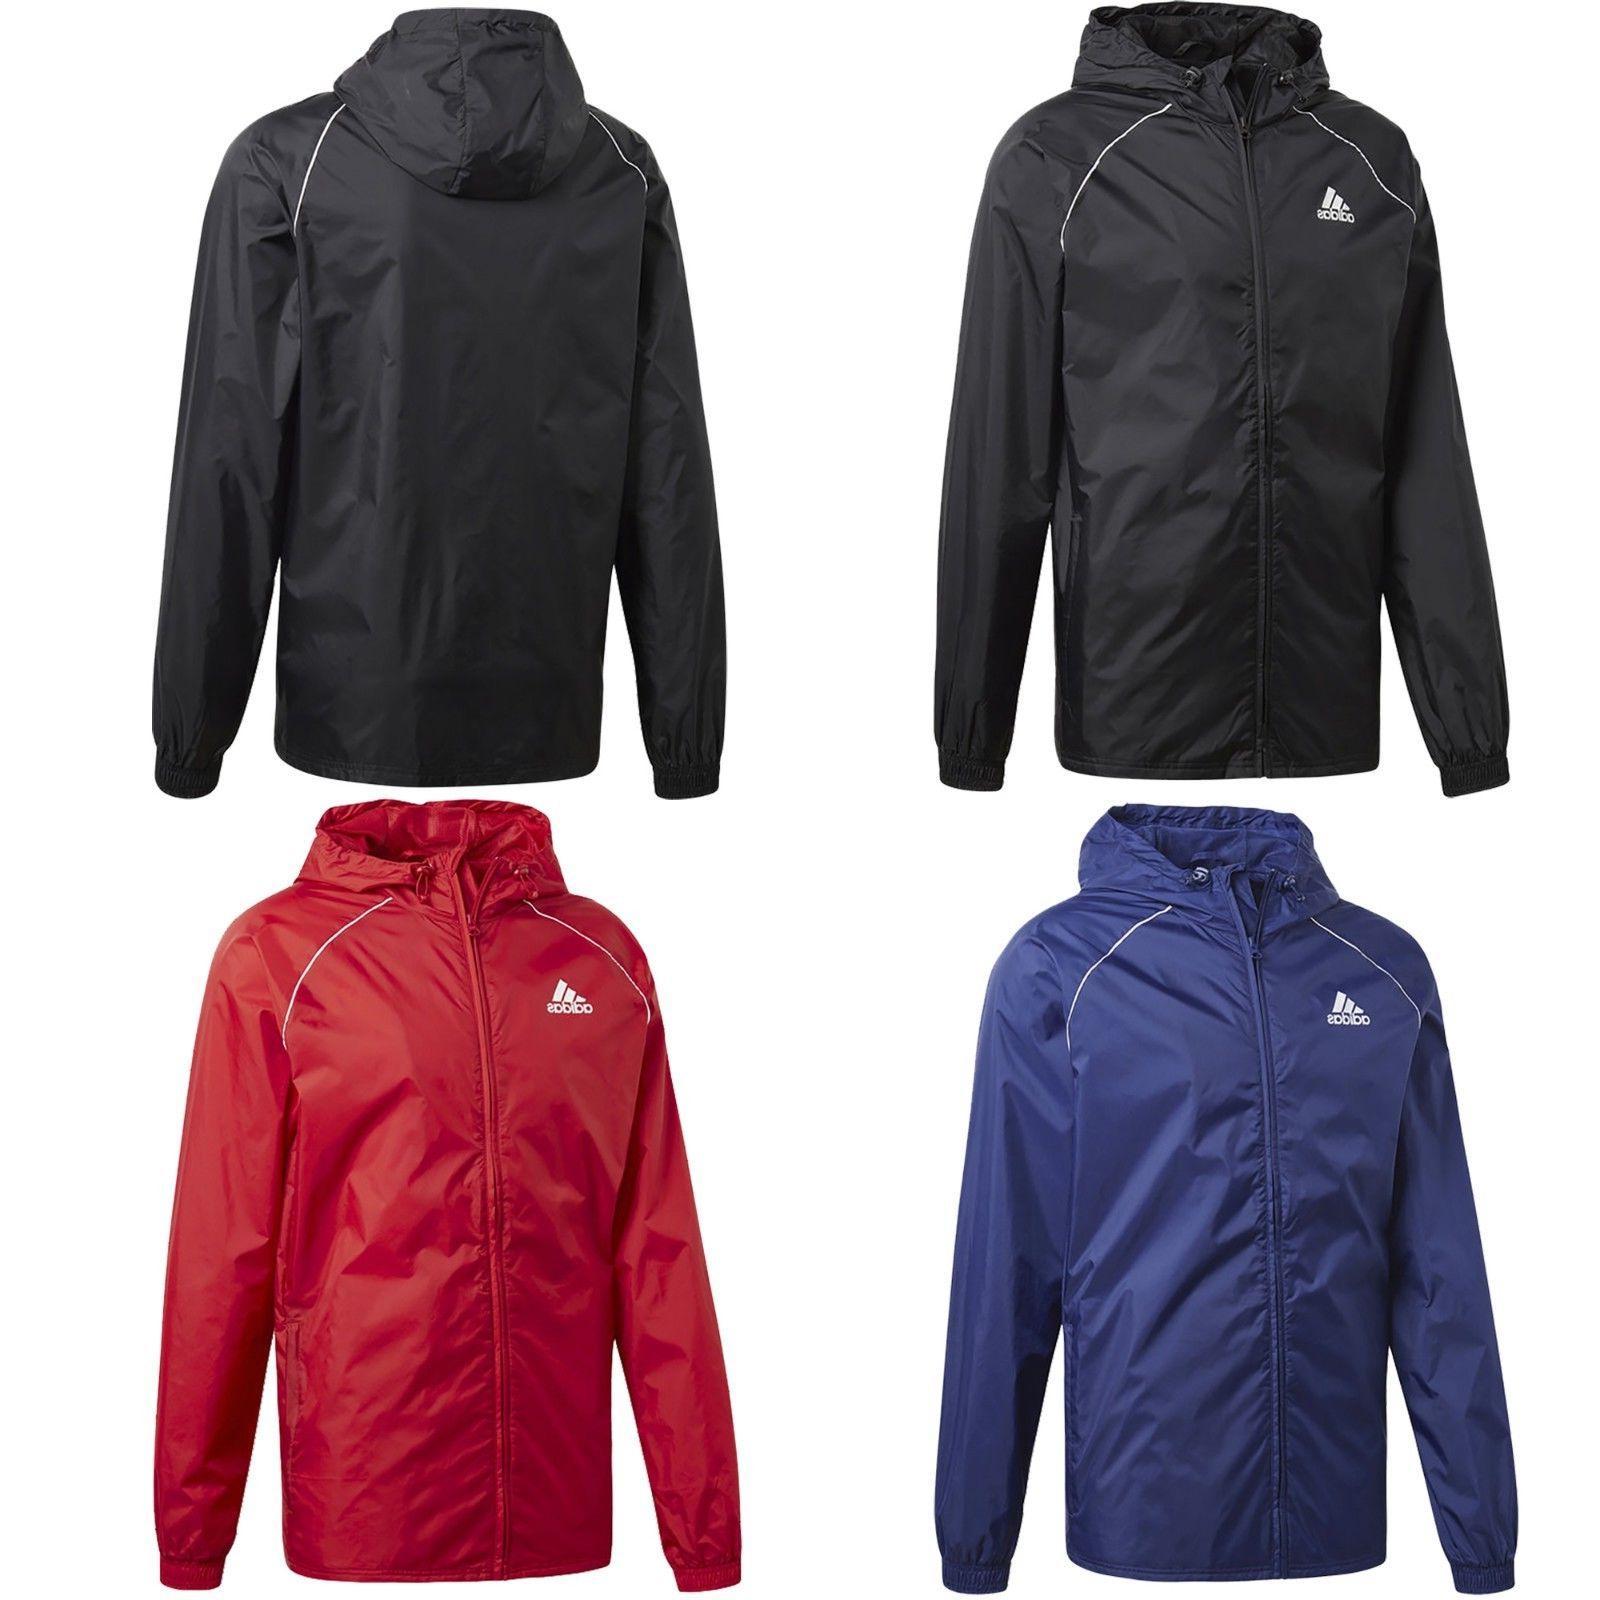 Adidas Rain Hooded Stopper